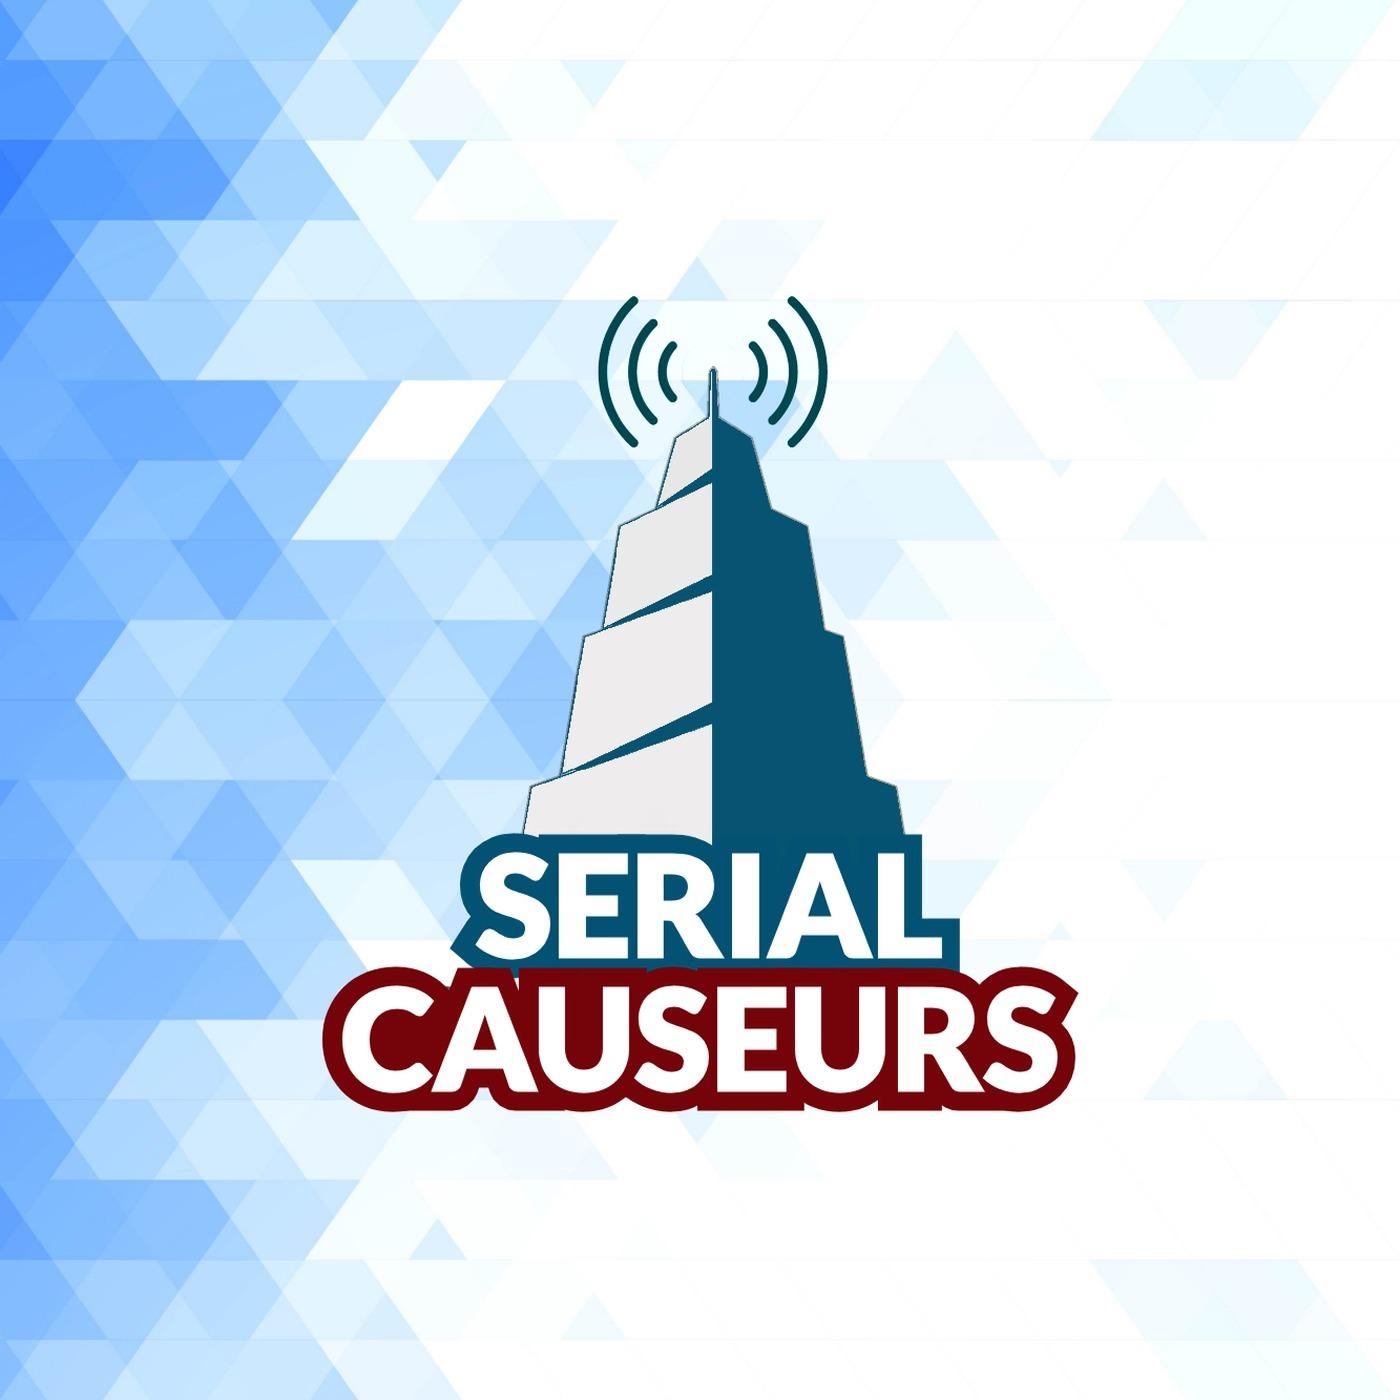 Serial Causeurs - votre watchtower 100% séries